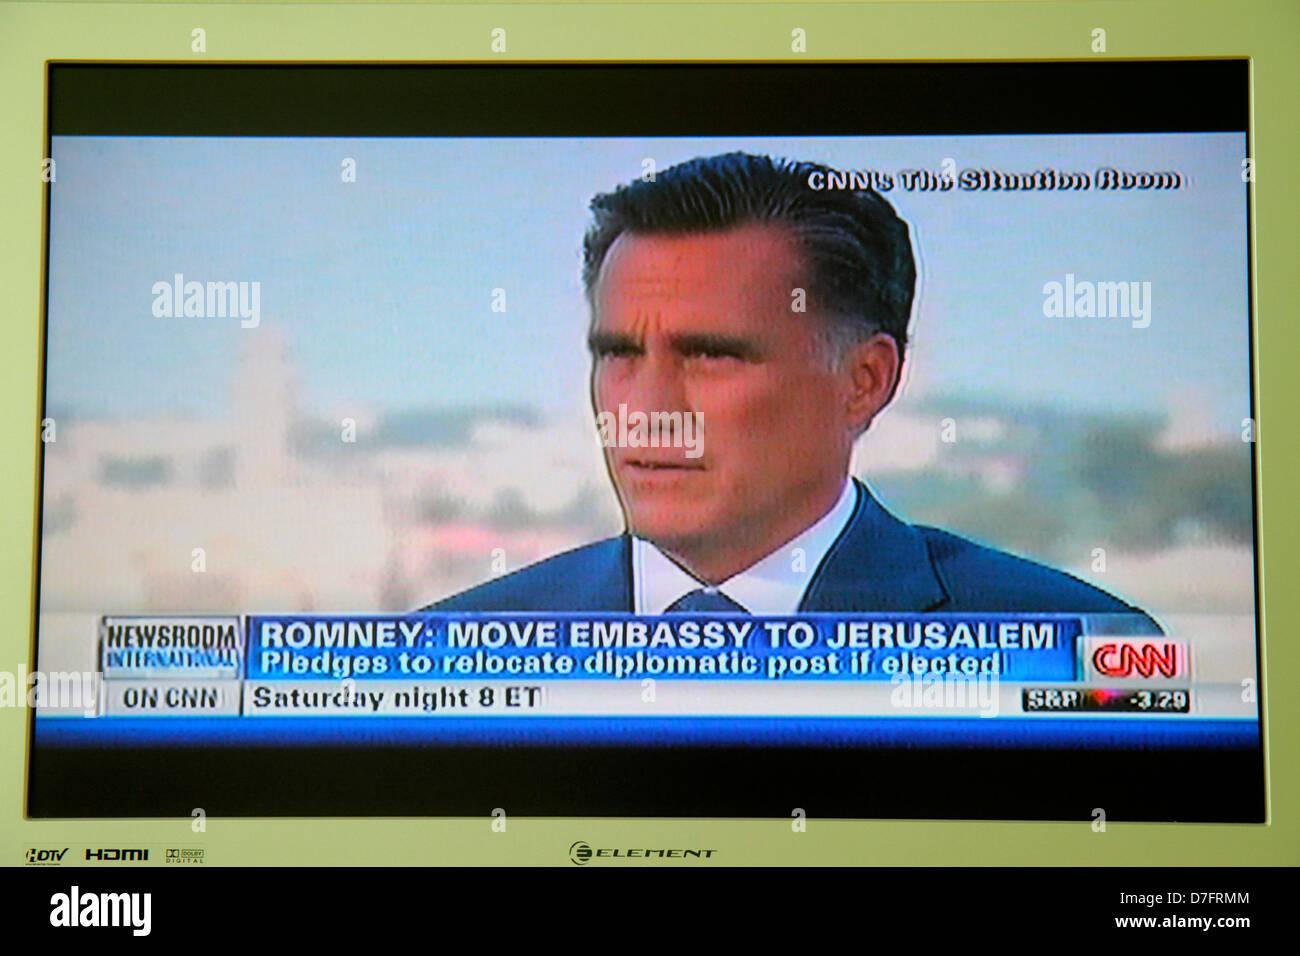 Miami Beach Florida TV television screen flat panel HDTV monitor CNN cable news Mitt Romney Republican presidential - Stock Image